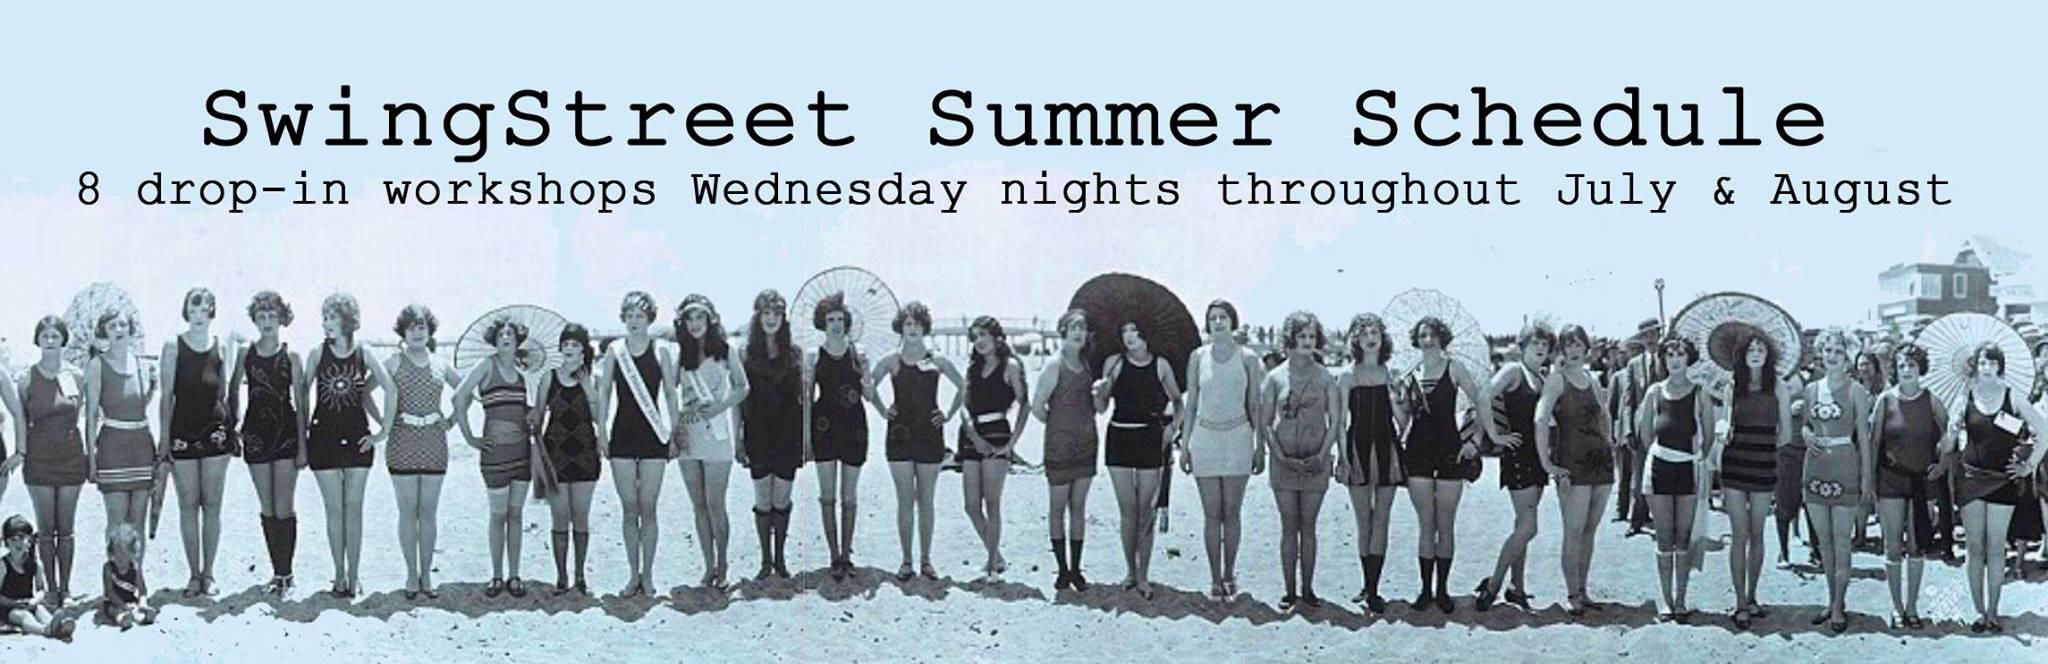 swingstreet summer schedule 2015.2